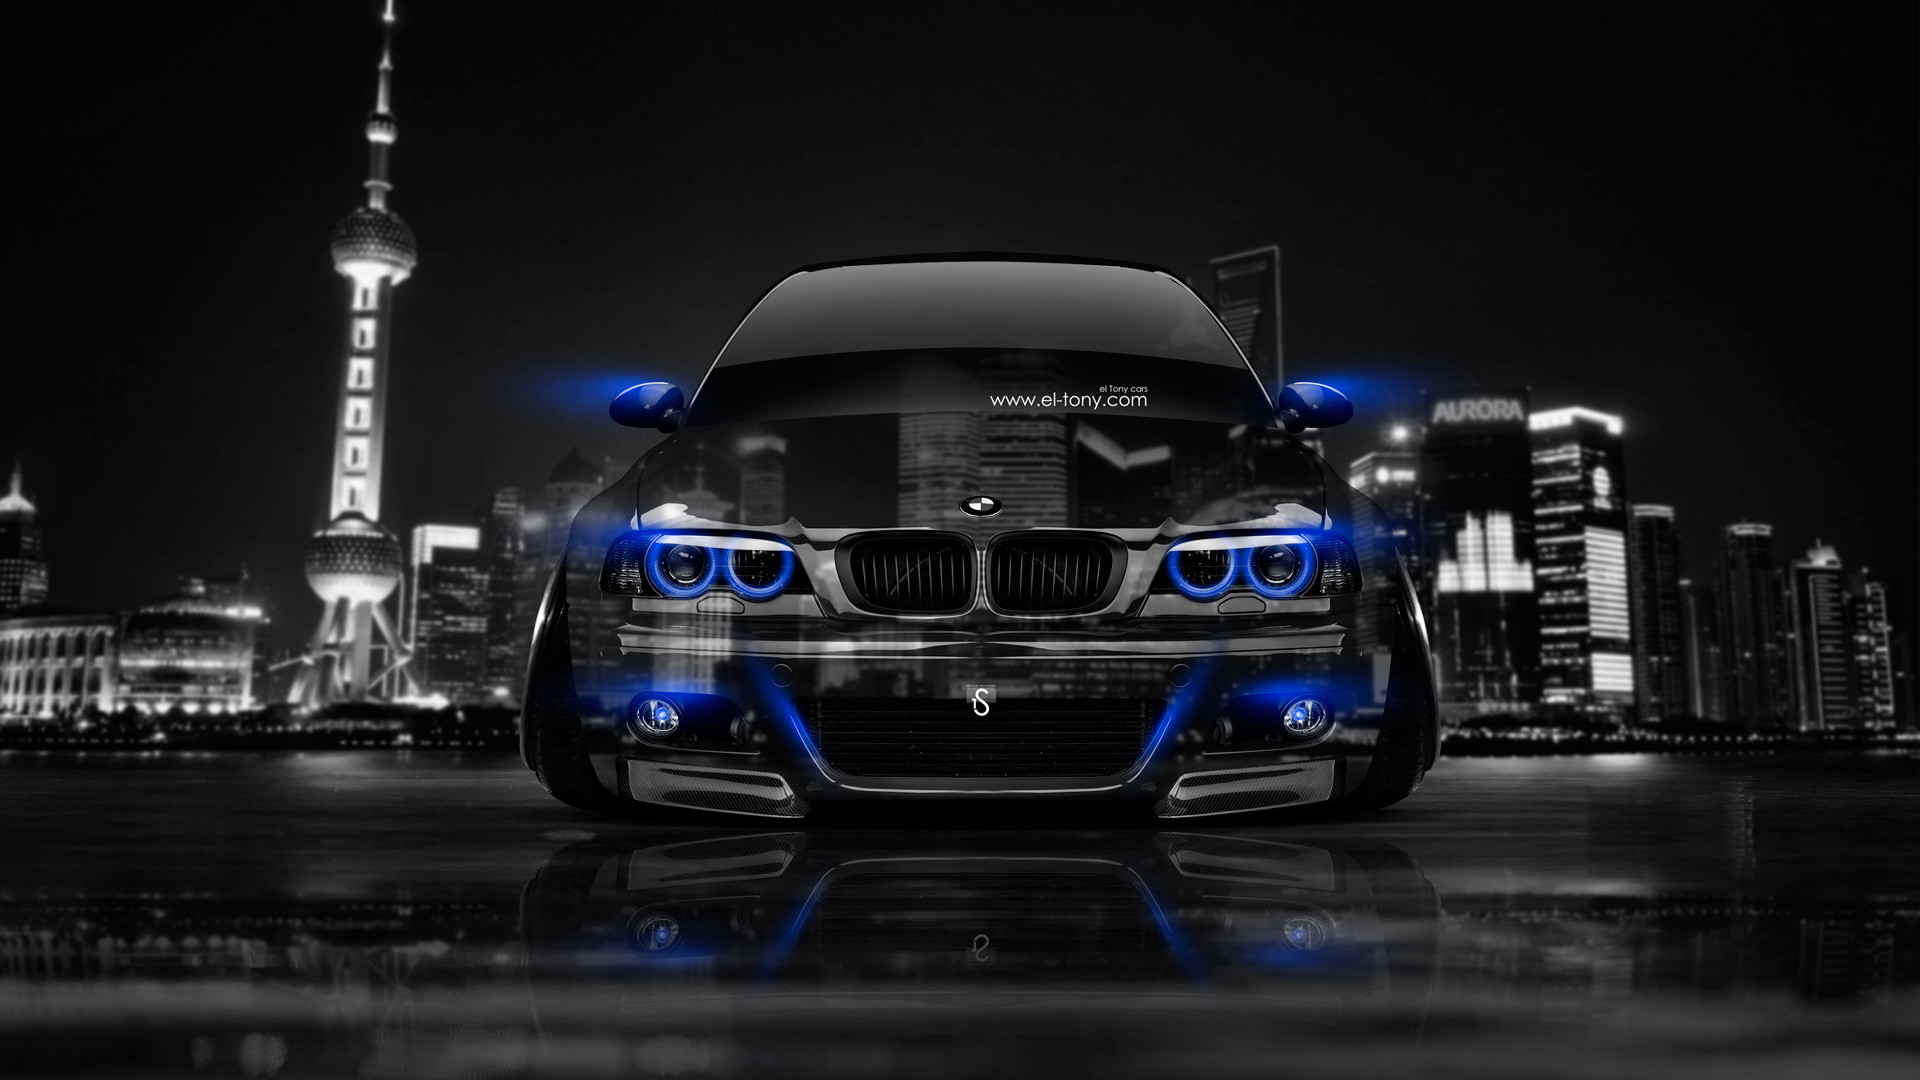 1920x1080 BMW M3 E46 Front Crystal City Car 2014  Ideas